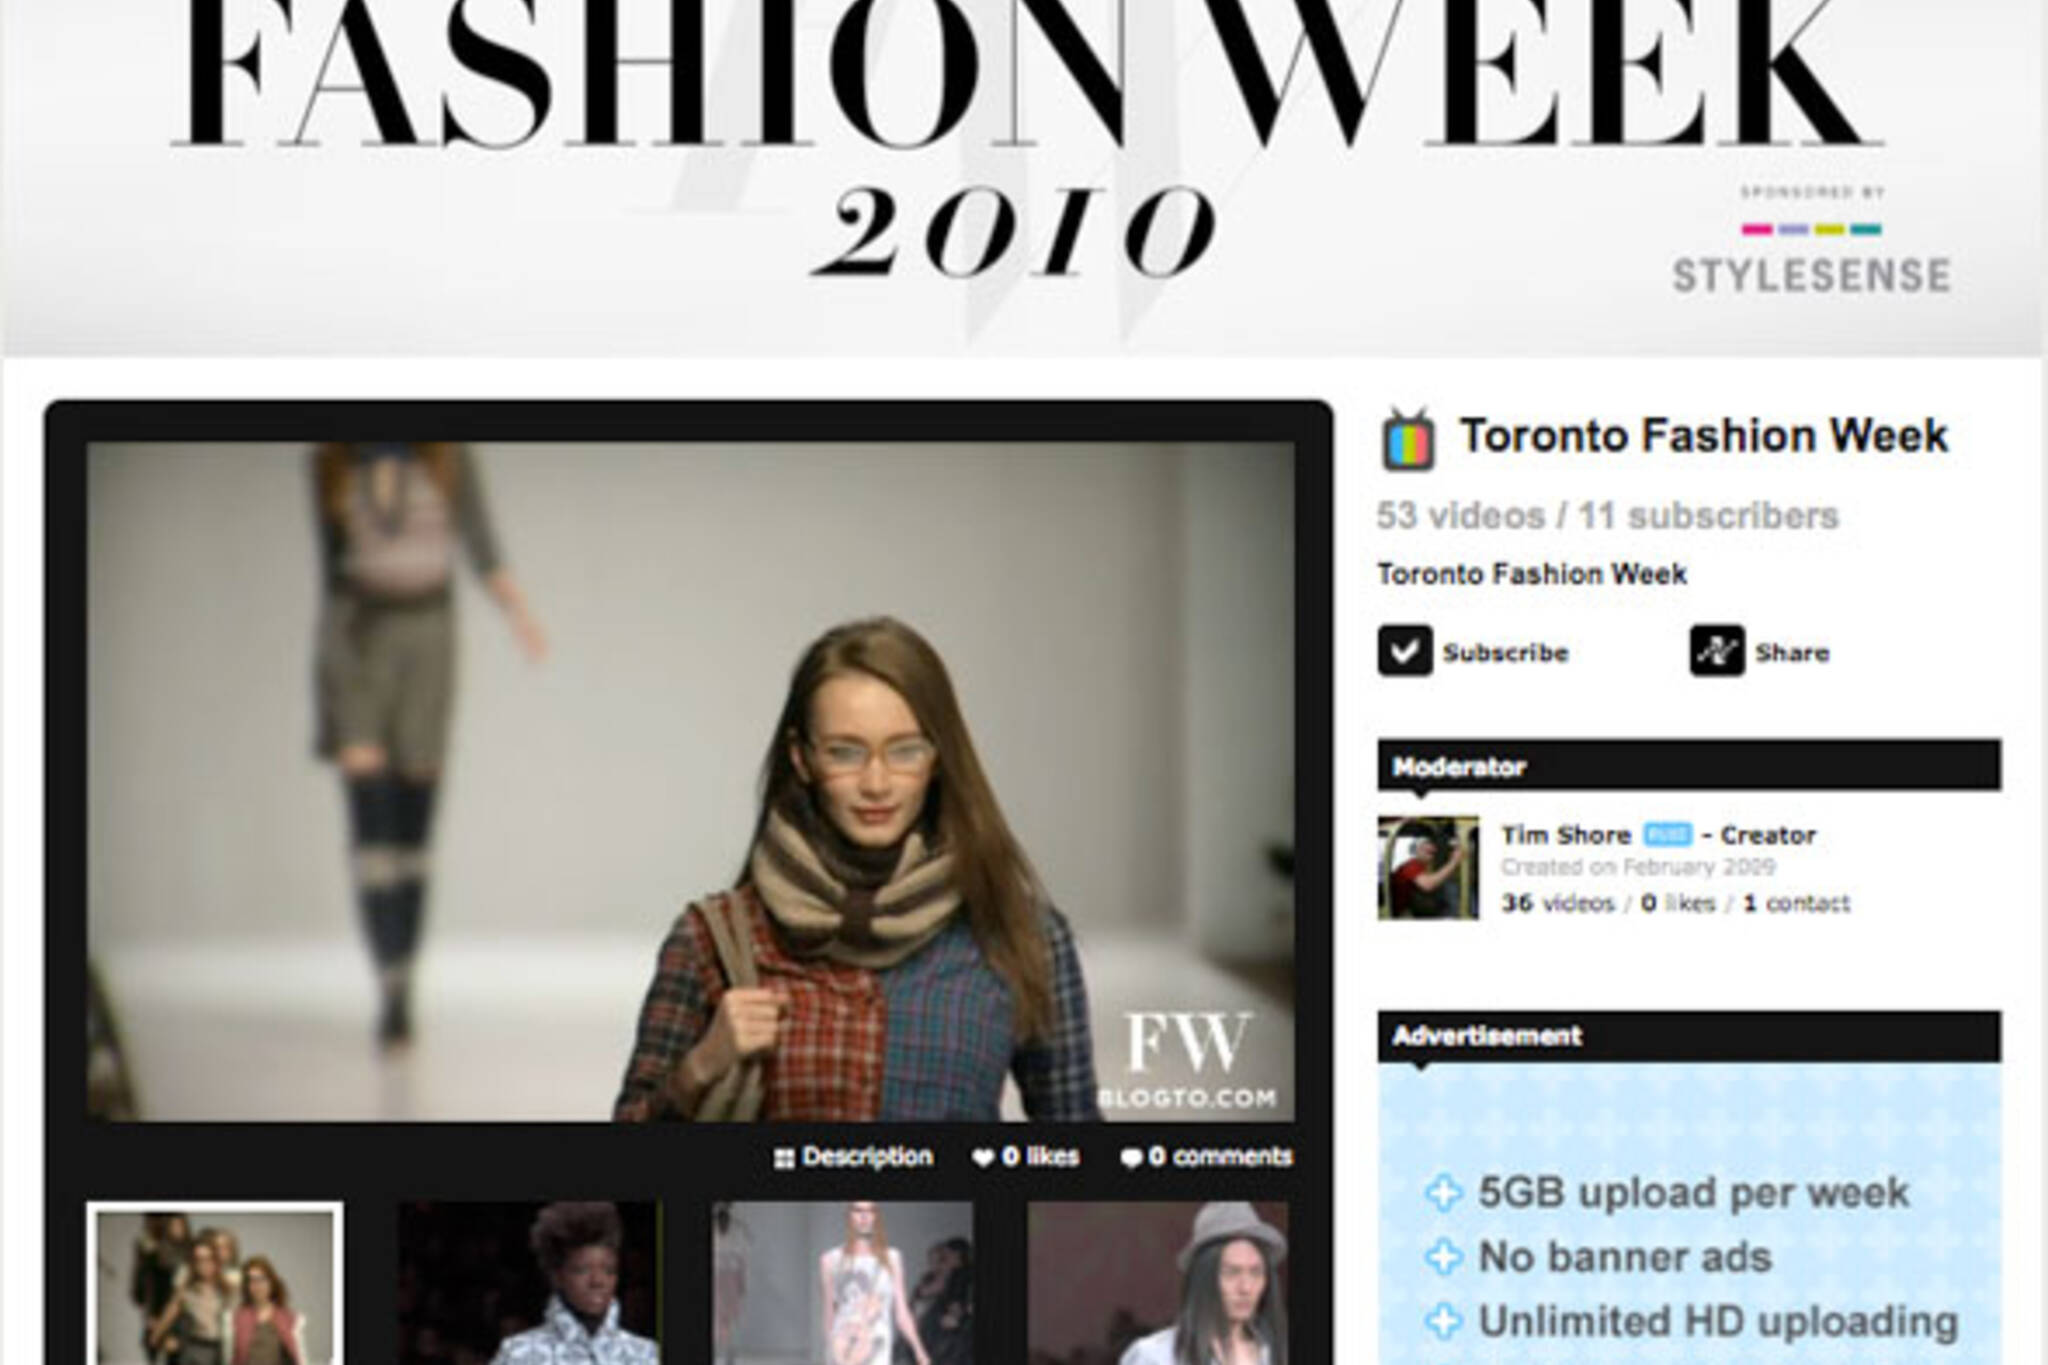 Toronto Fashion Week Videos